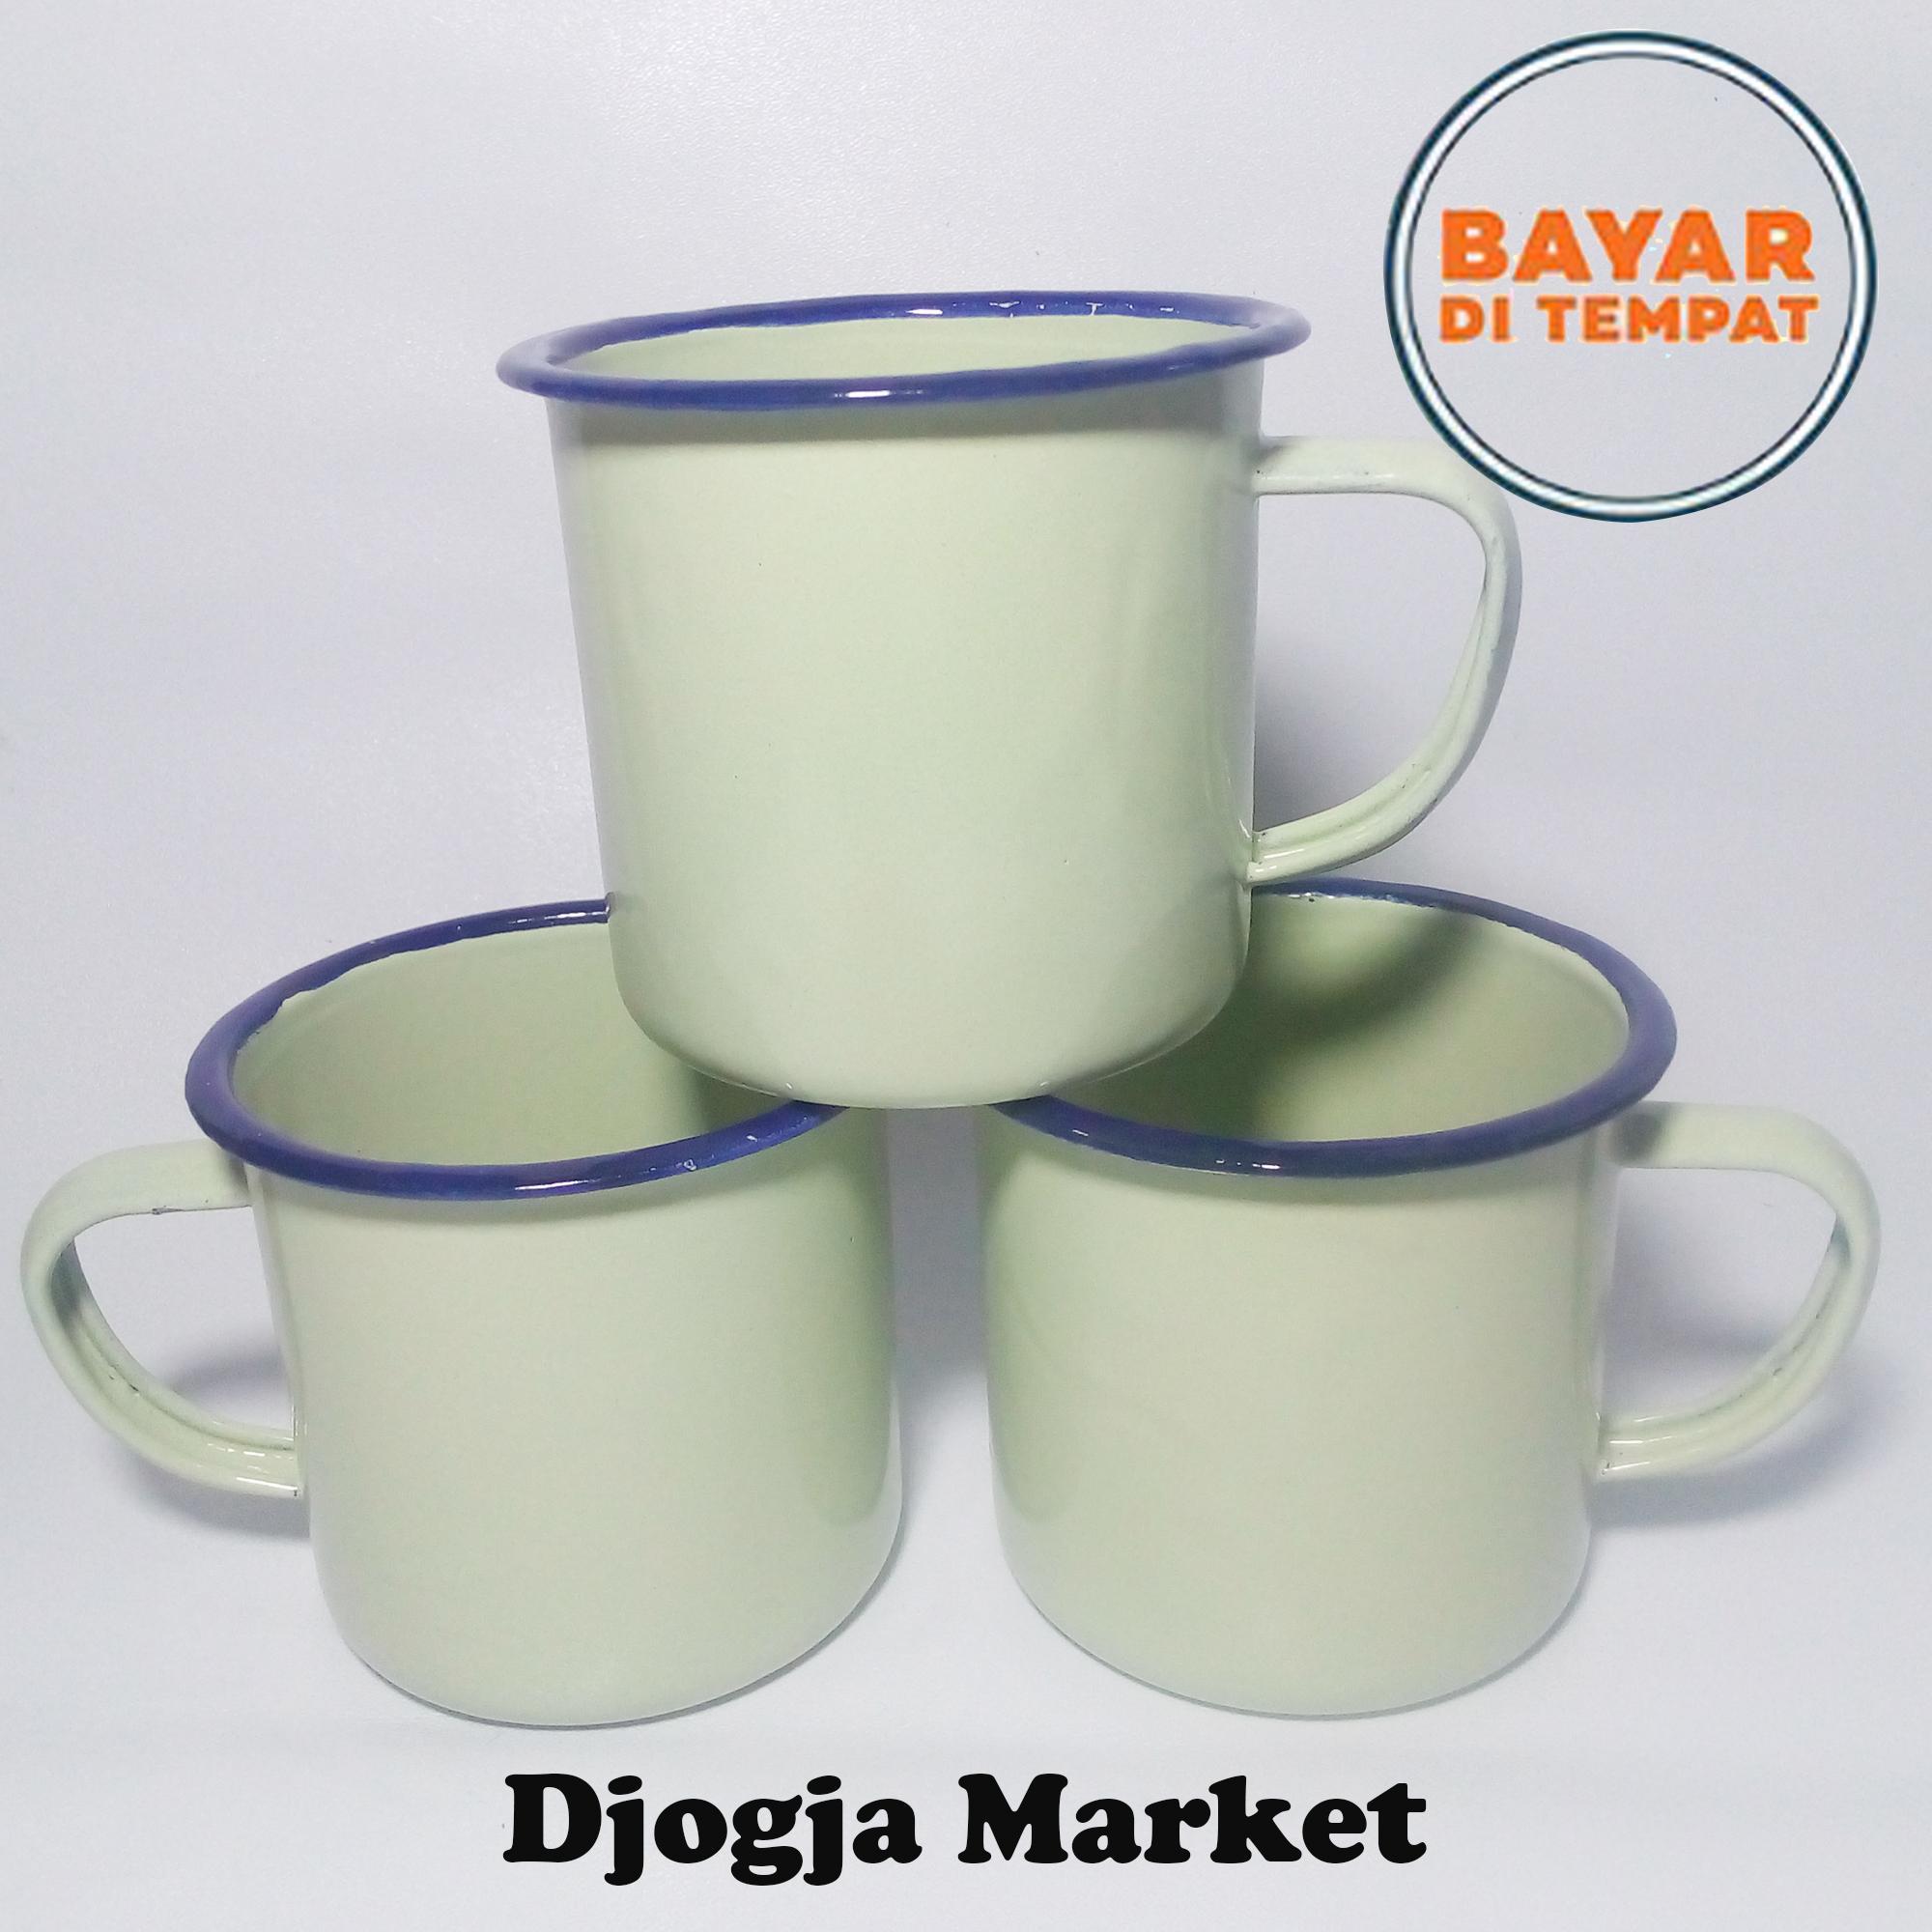 Detail Gambar Djogja Market - Cangkir Enamel | Gelas Jadul | Cangkir Enamel Hijau | Cangkir Kopi | Gelas Kopi Terbaru